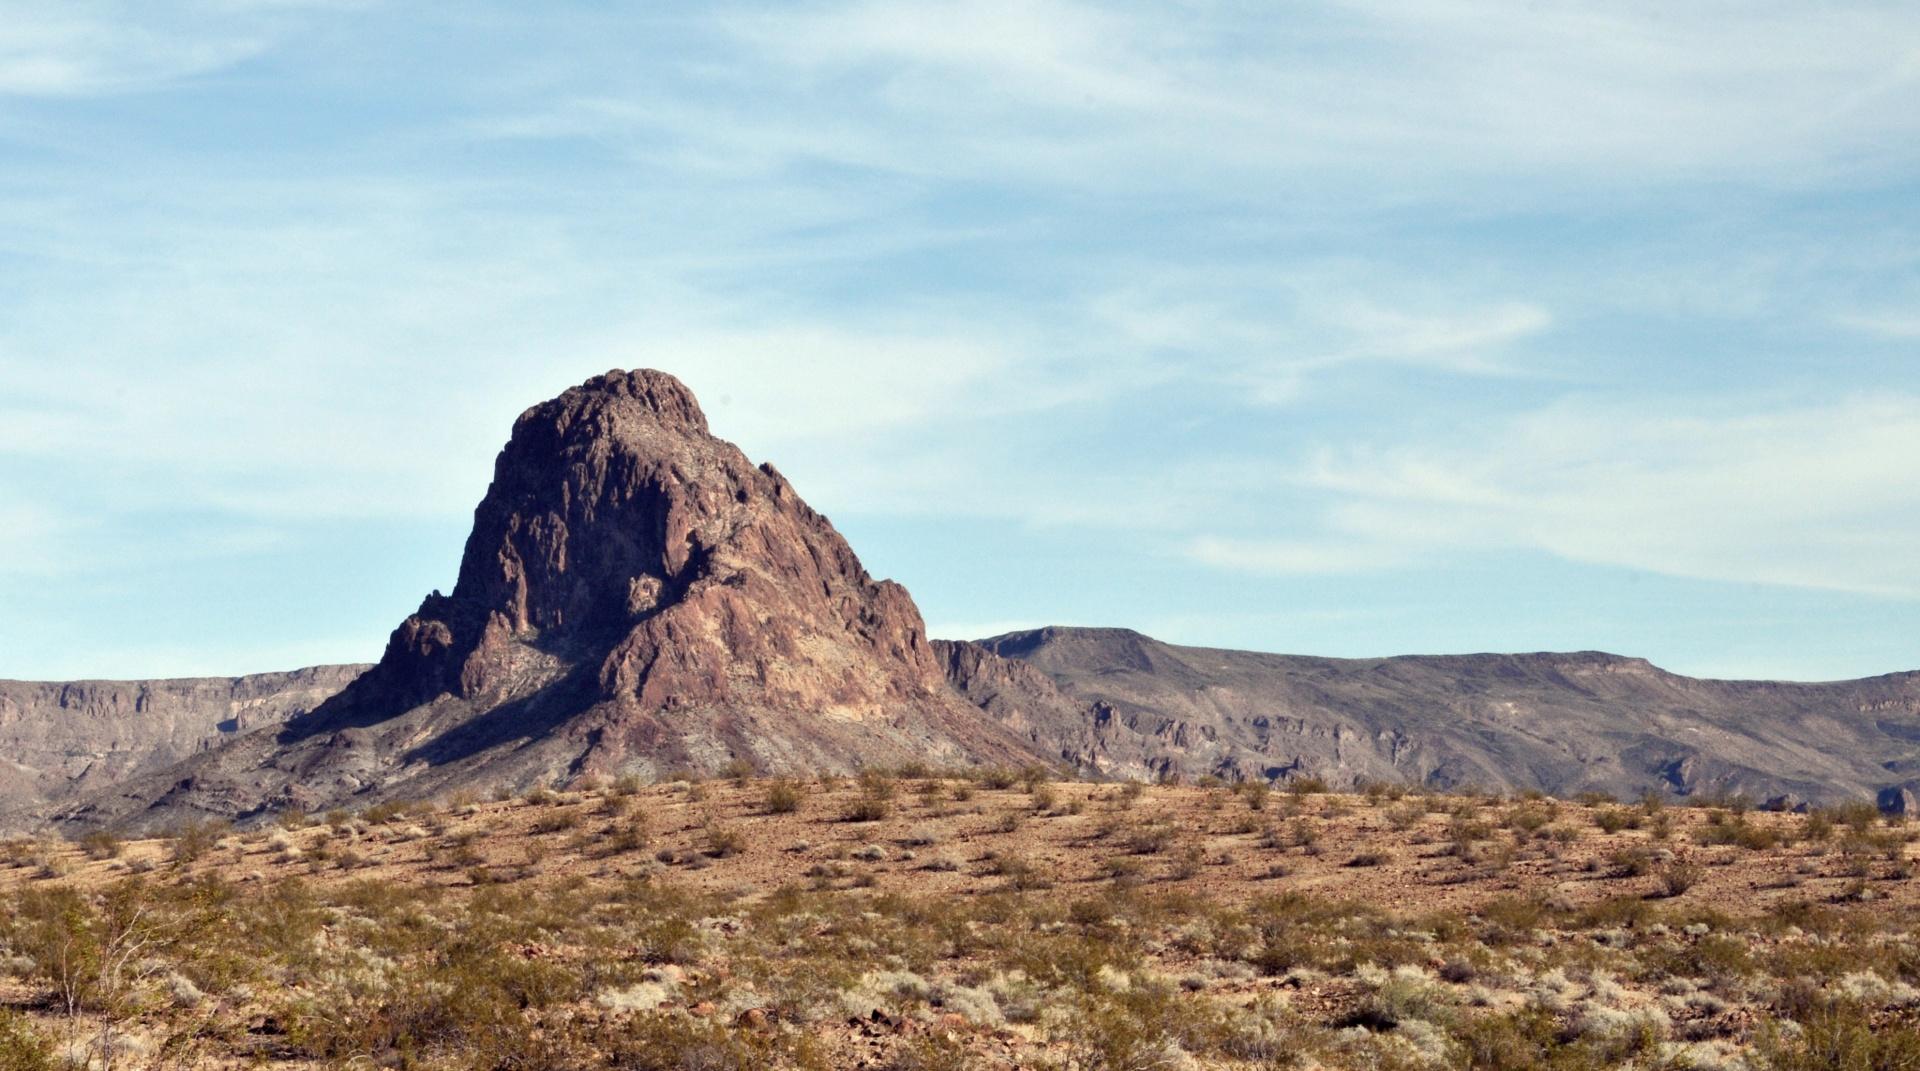 Desert Rock Mountain Free Stock Photo - Public Domain Pictures